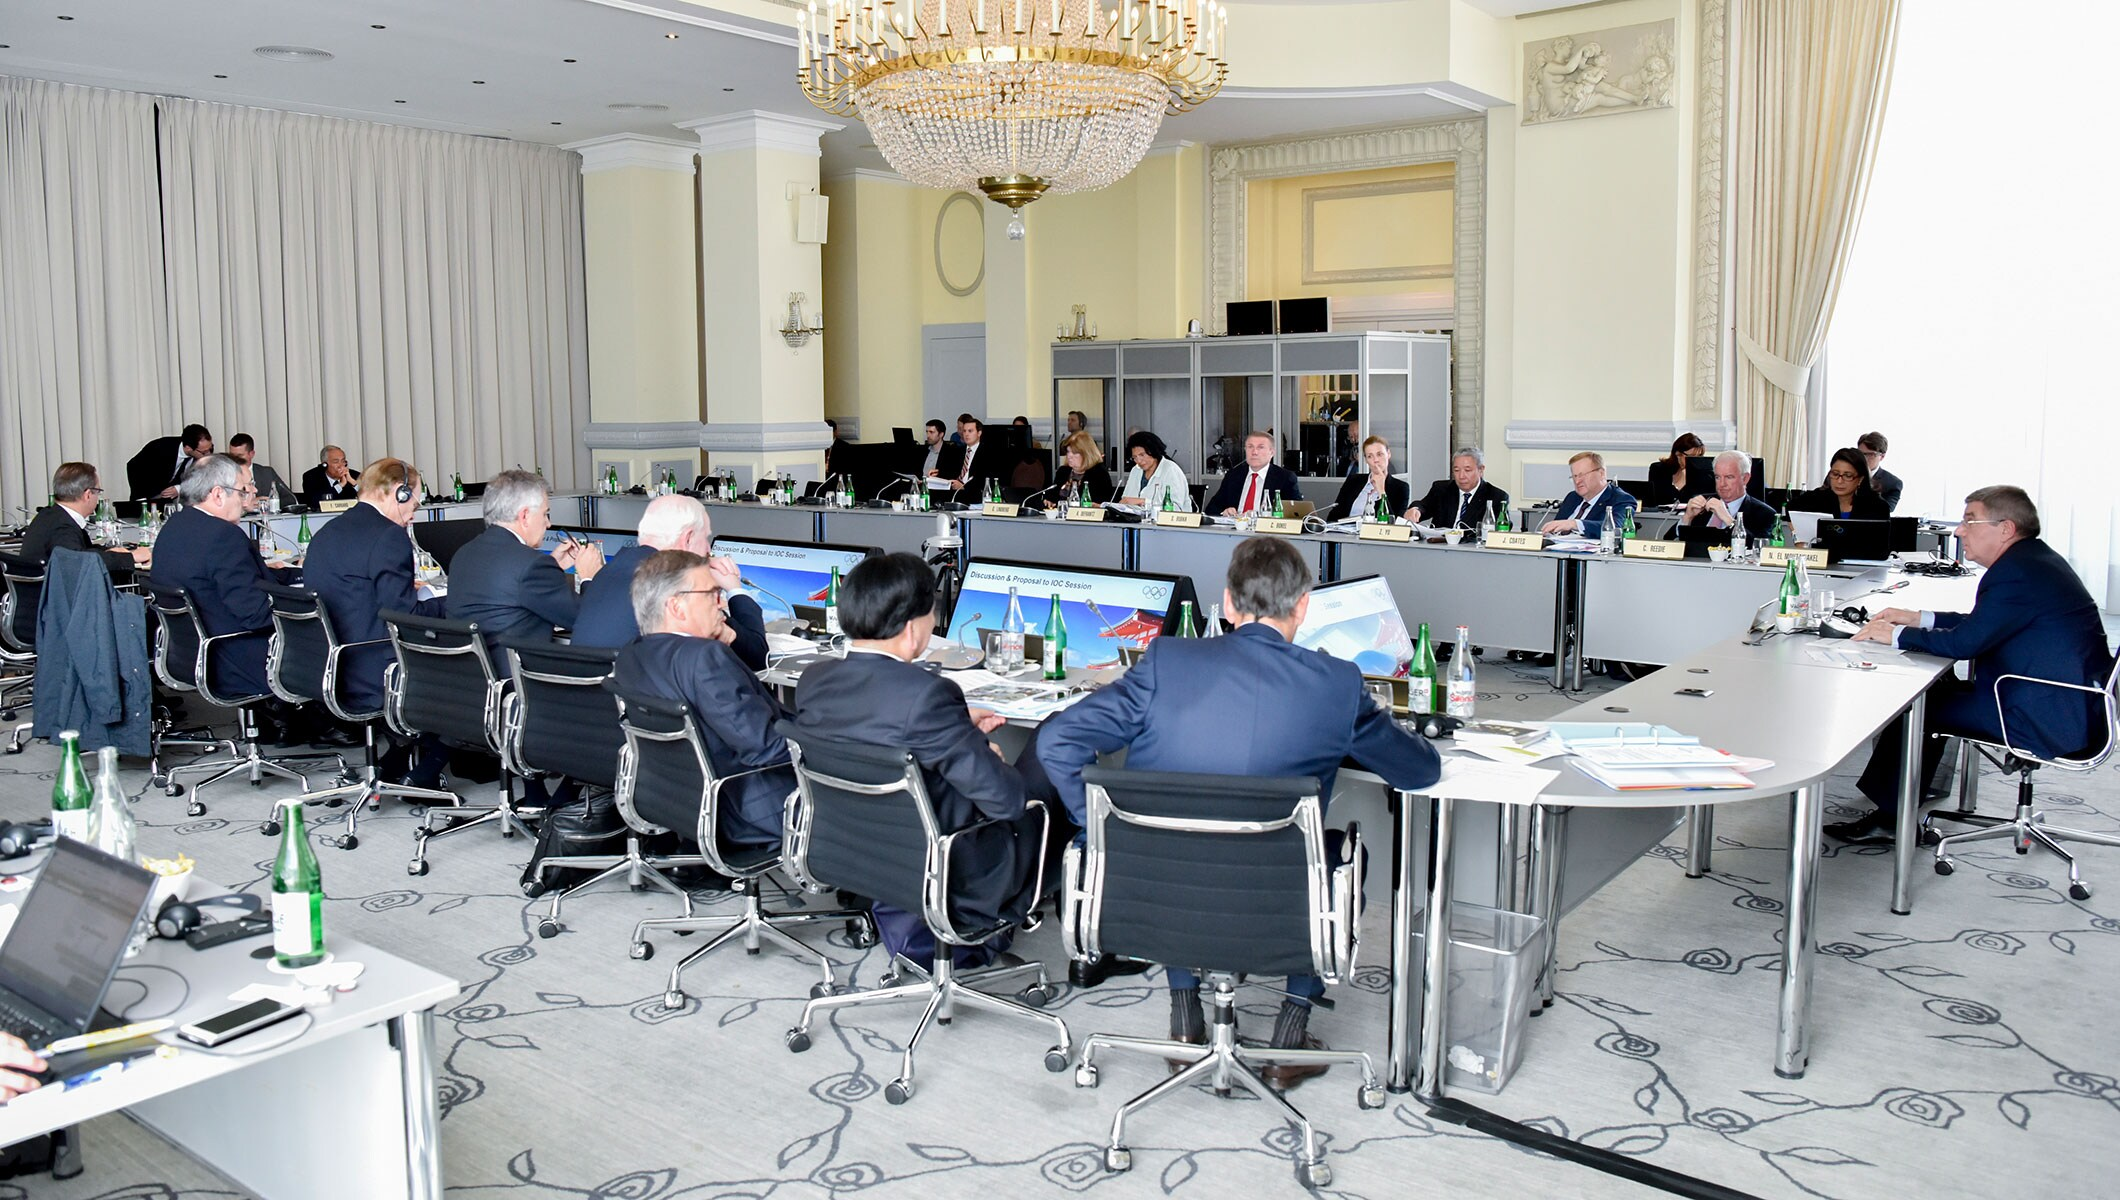 IOC Executive Board meeting Lausanne, June 1, 2016